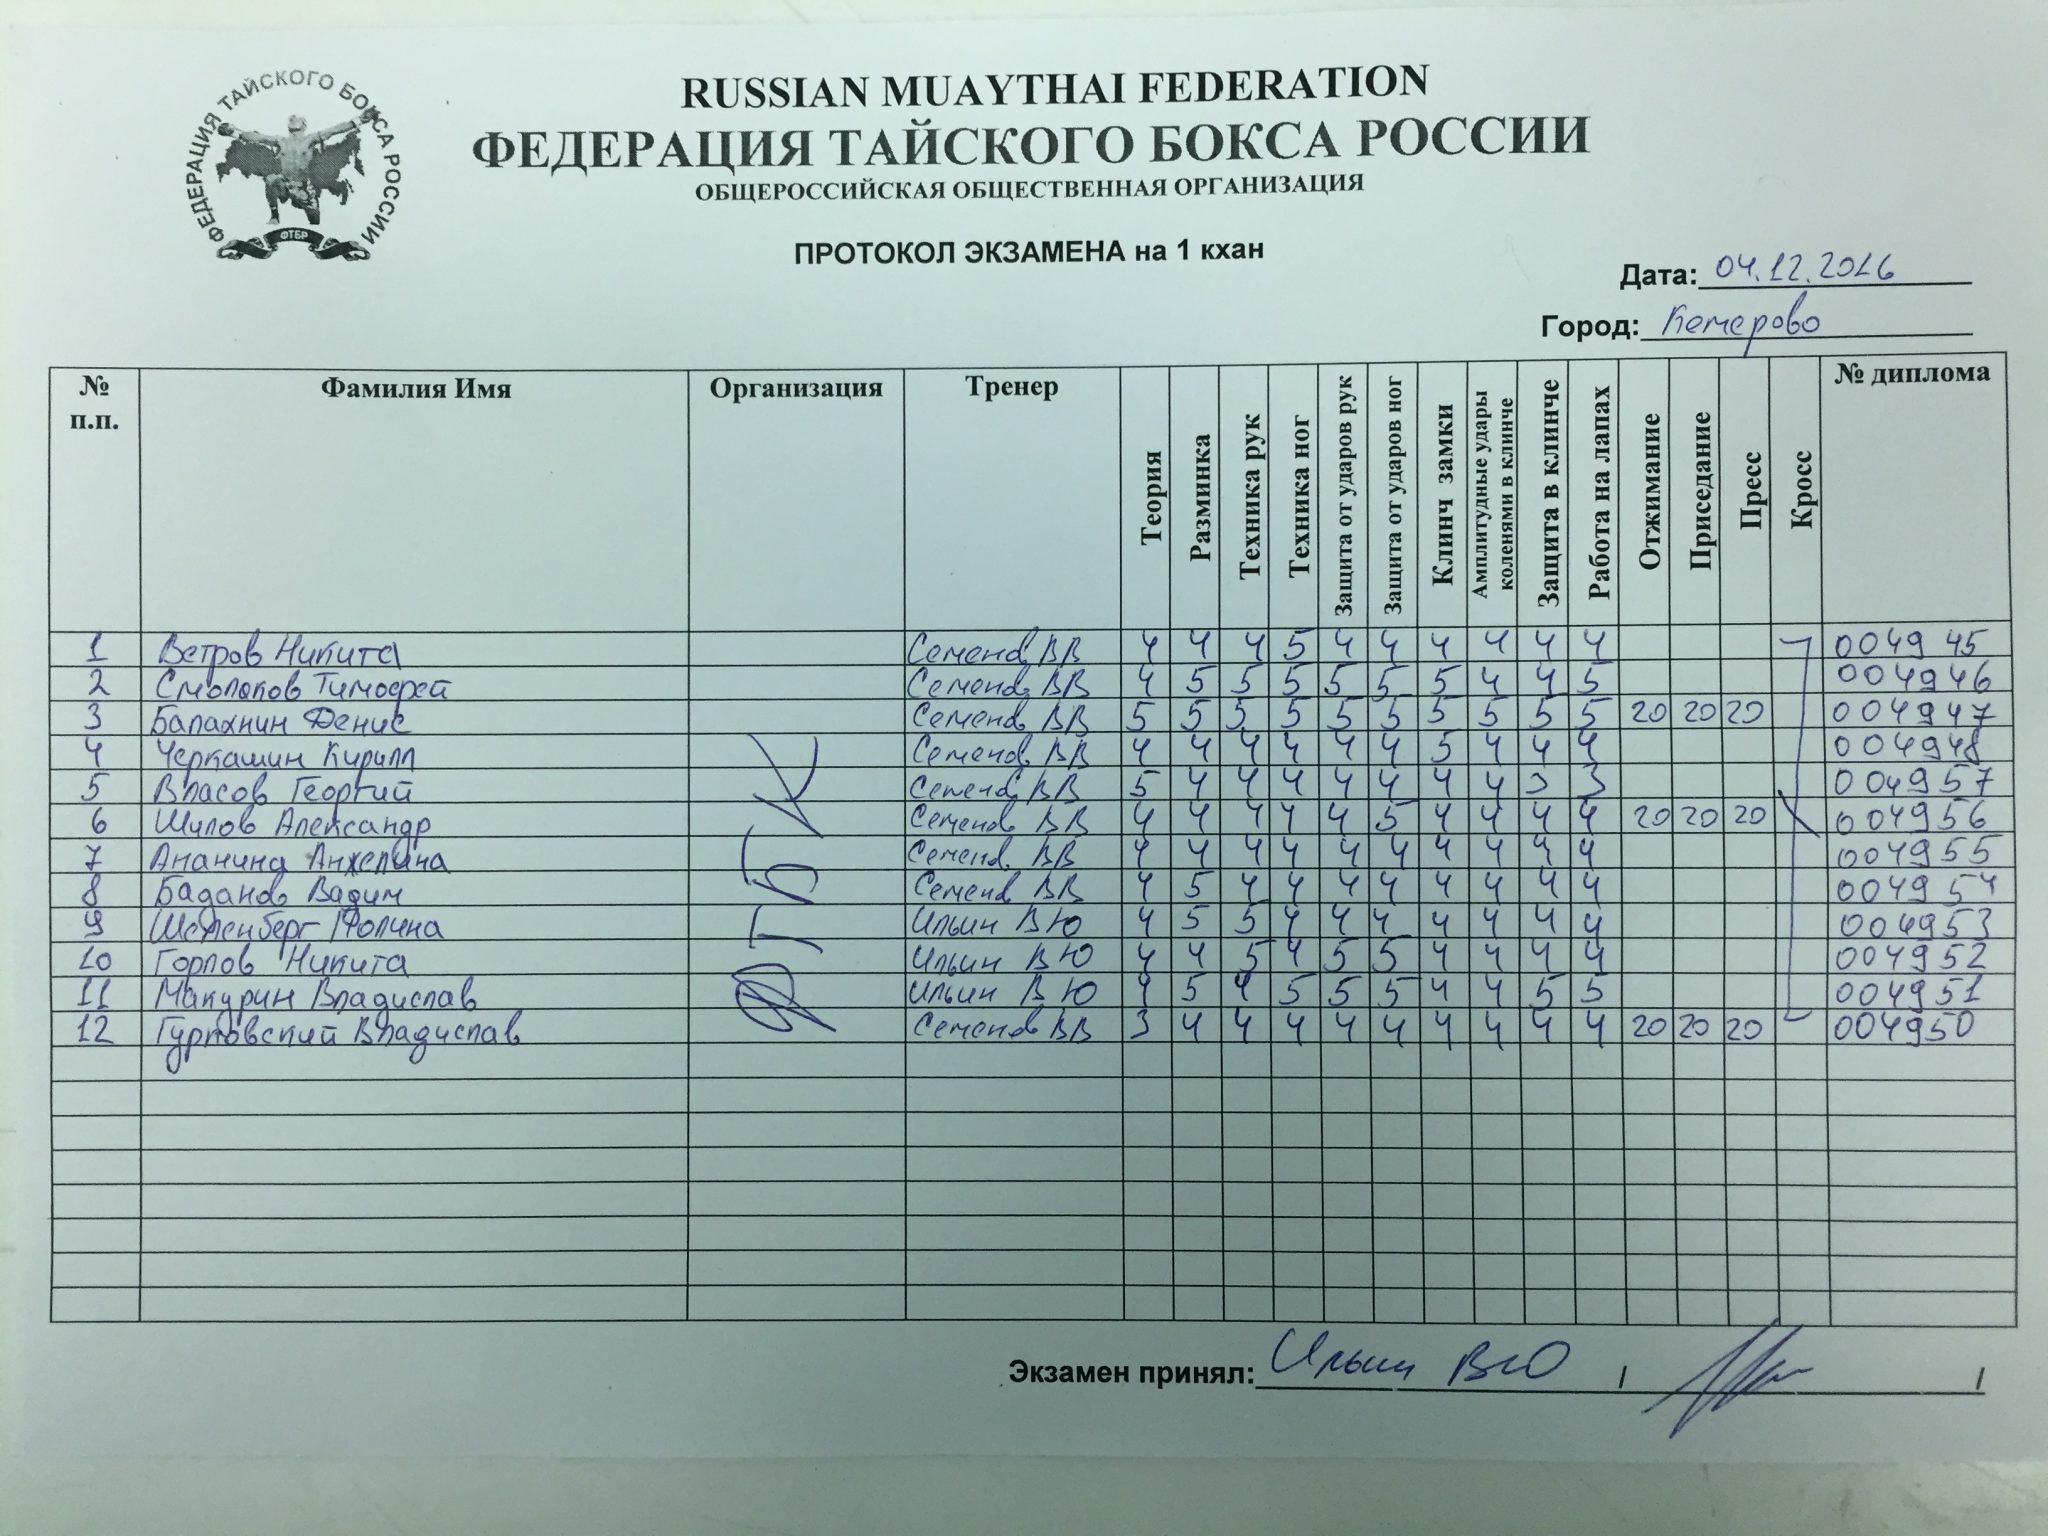 2016-12-04-kemerovo-1k-12p